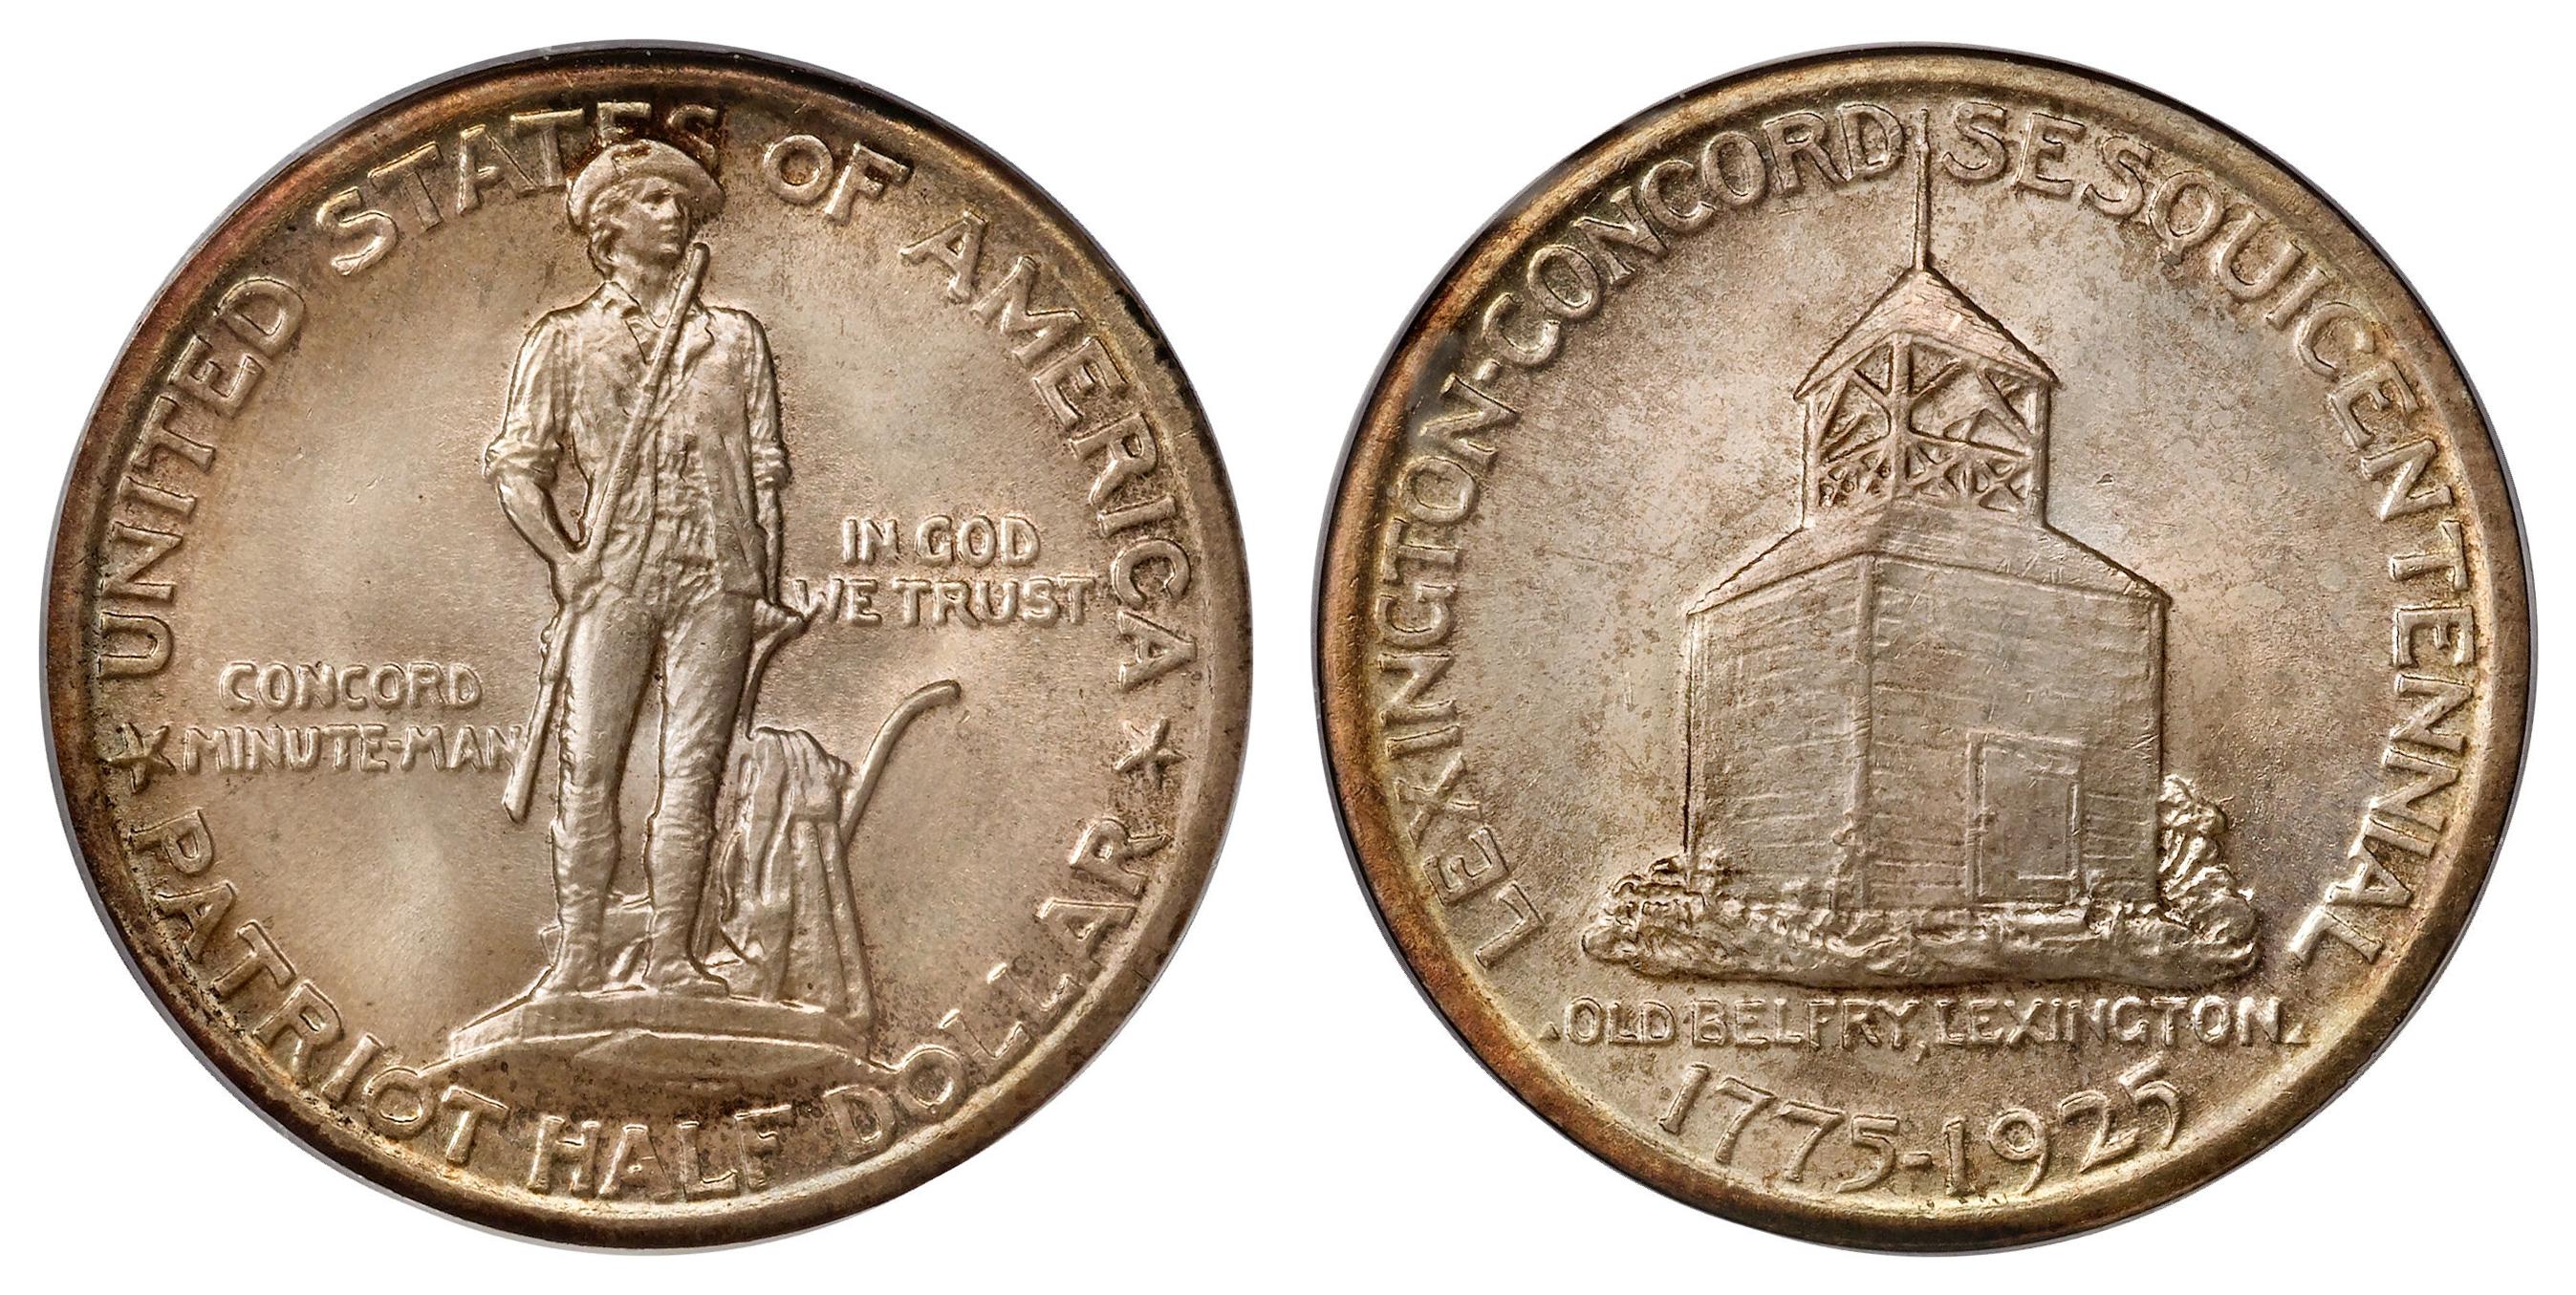 Lexington-Concord Sesquicentennial half dollar - Wikipedia